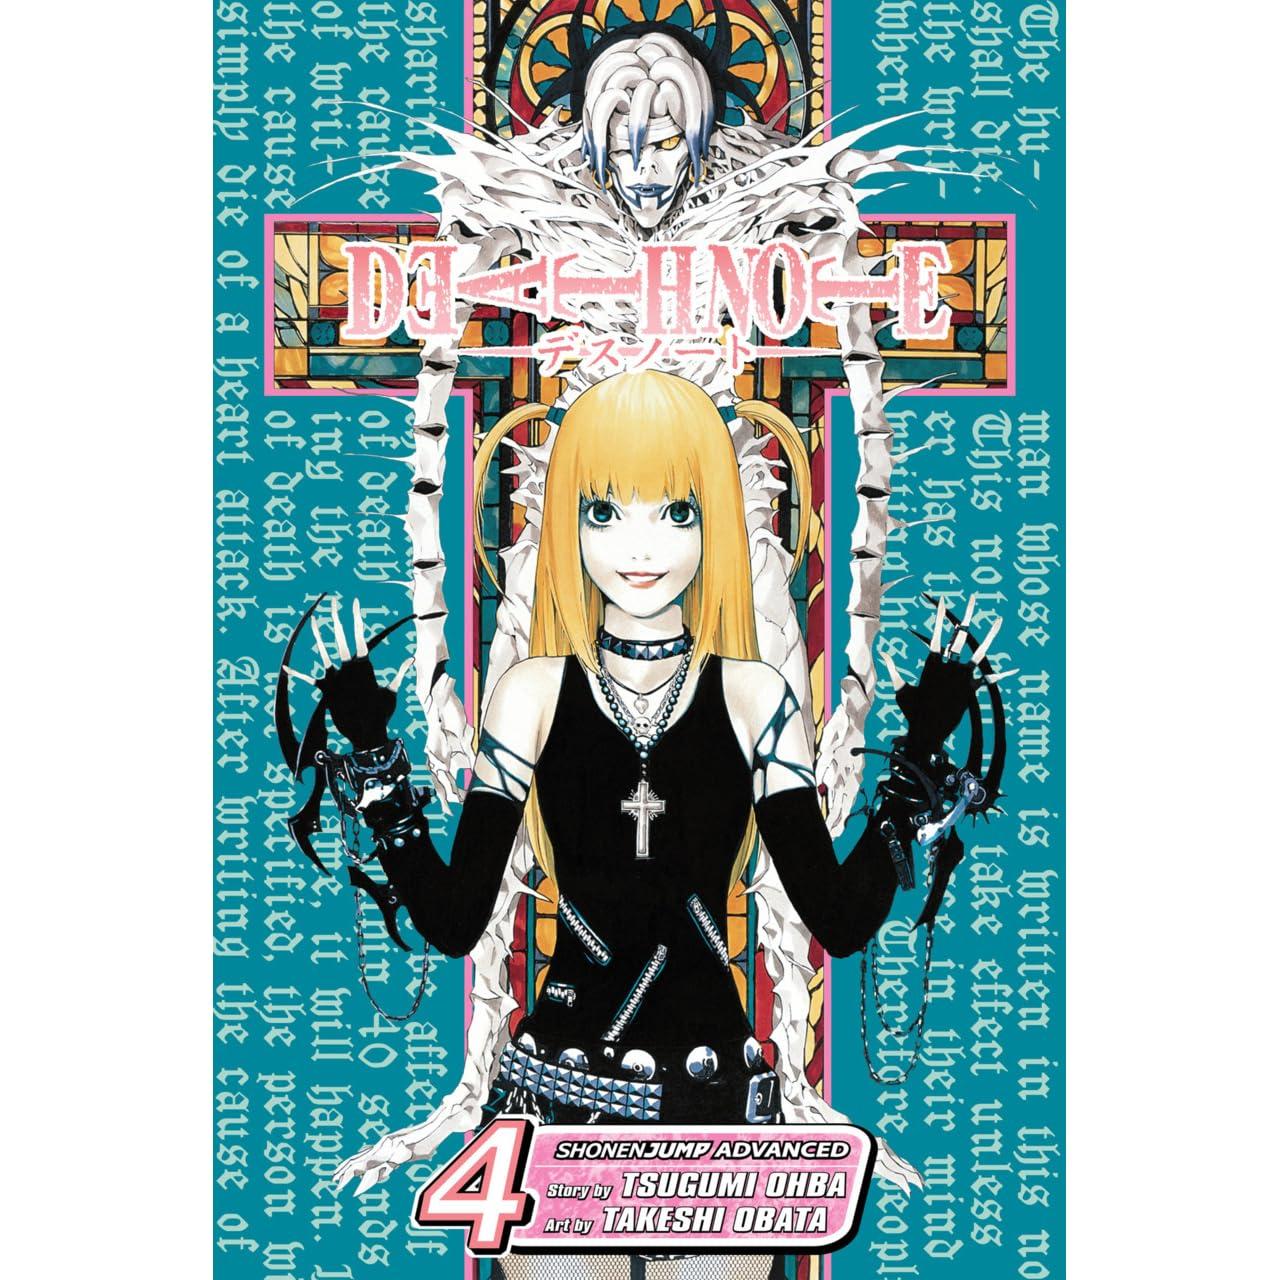 Read Death Note Vol 4 Love Death Note 4 By Tsugumi Ohba